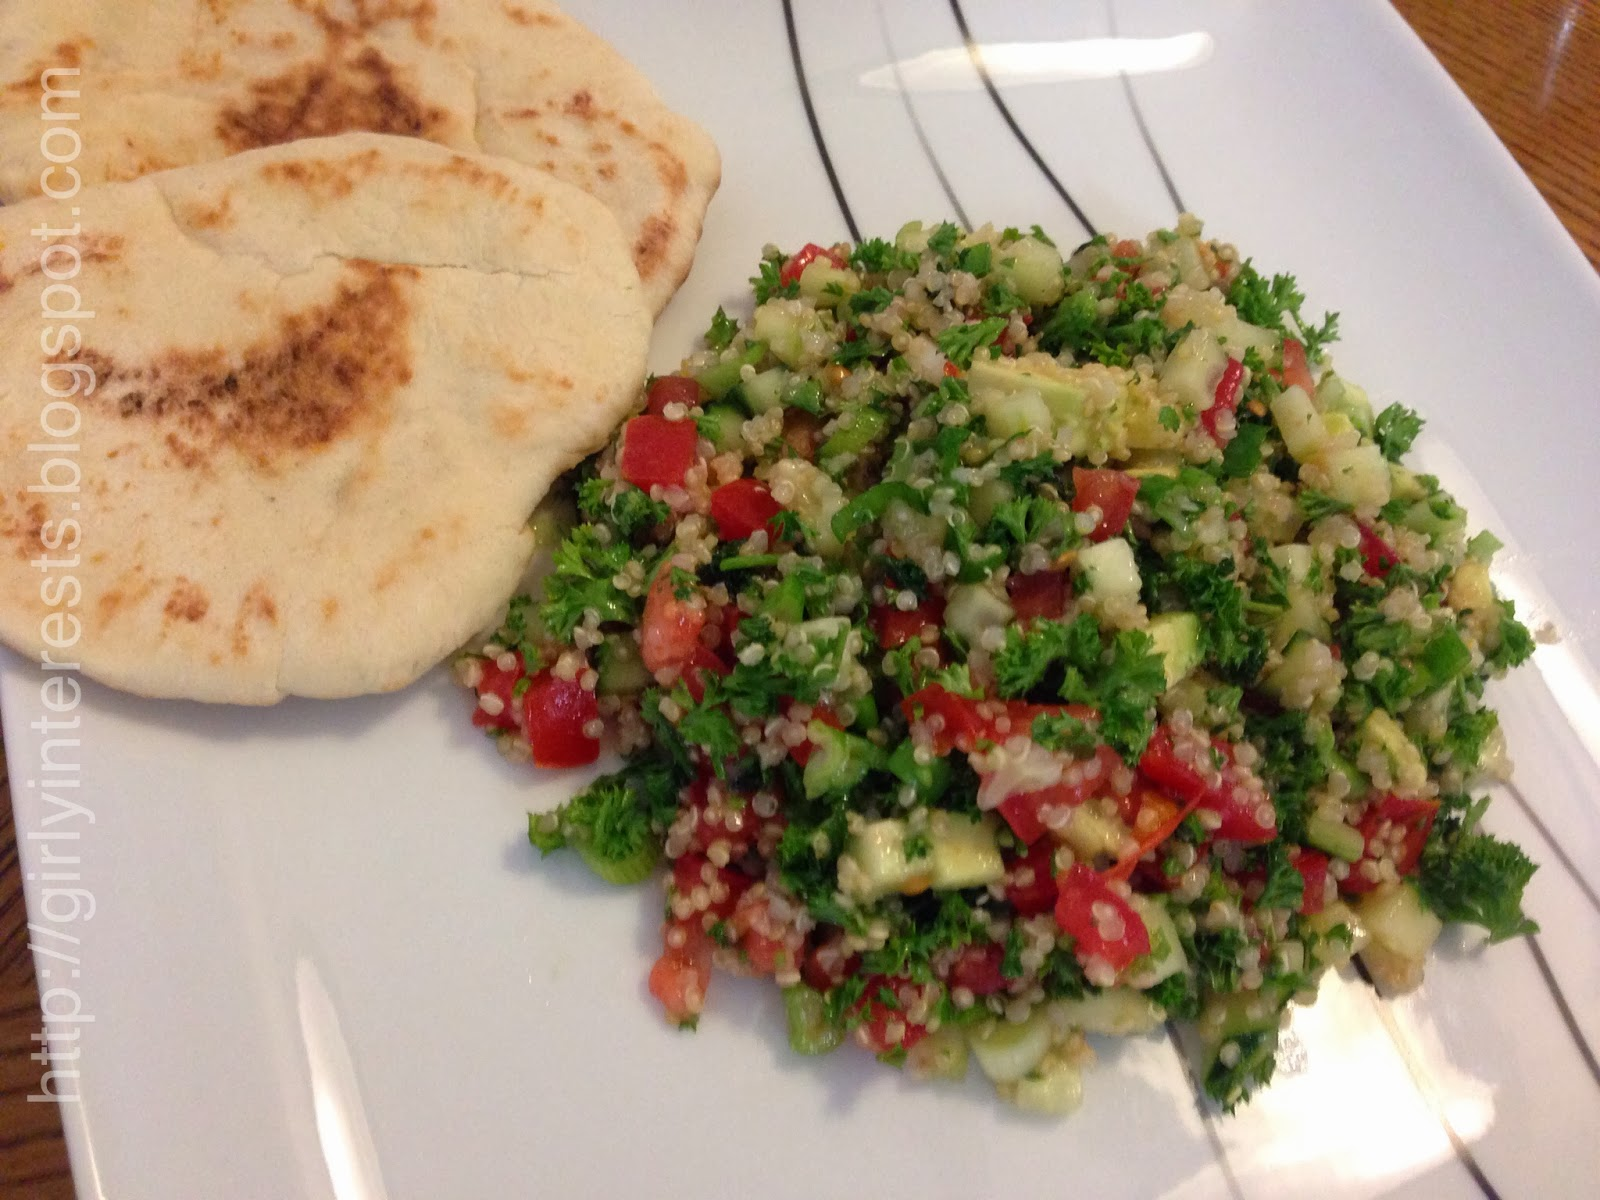 girlyinterests.blogspot.com - quinoa tabbuleh salad with avocado